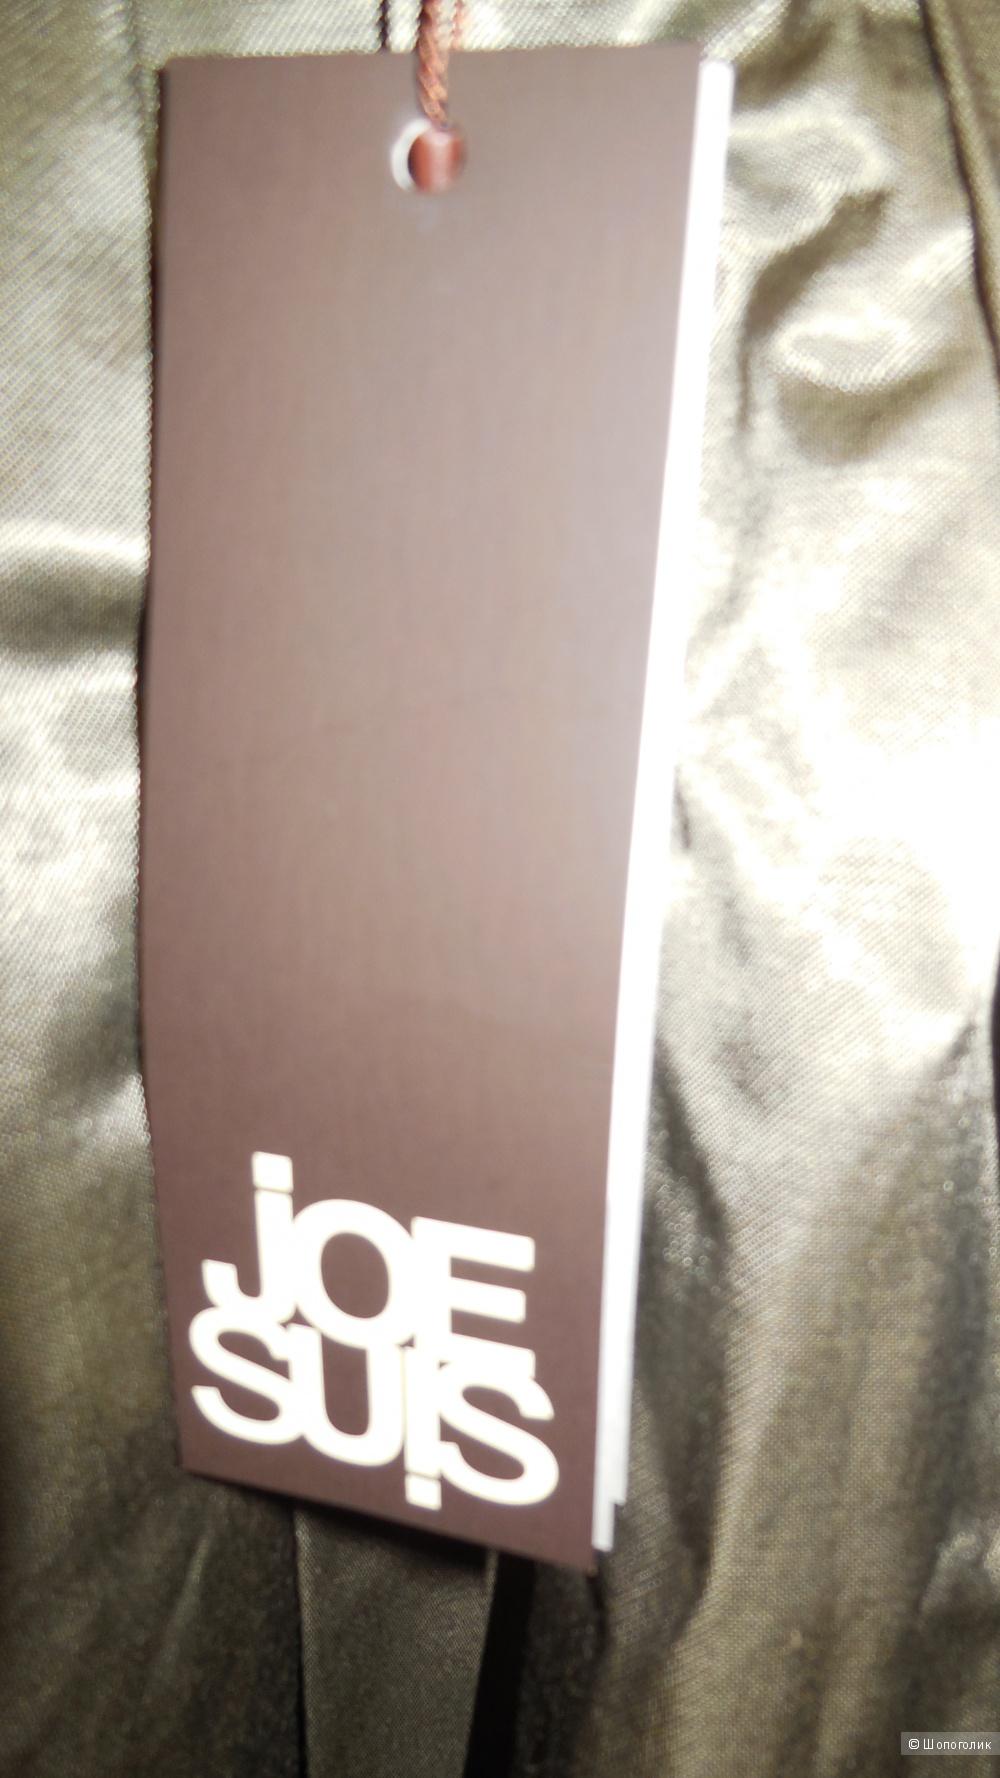 Юбка Joe Suis, размер 42.